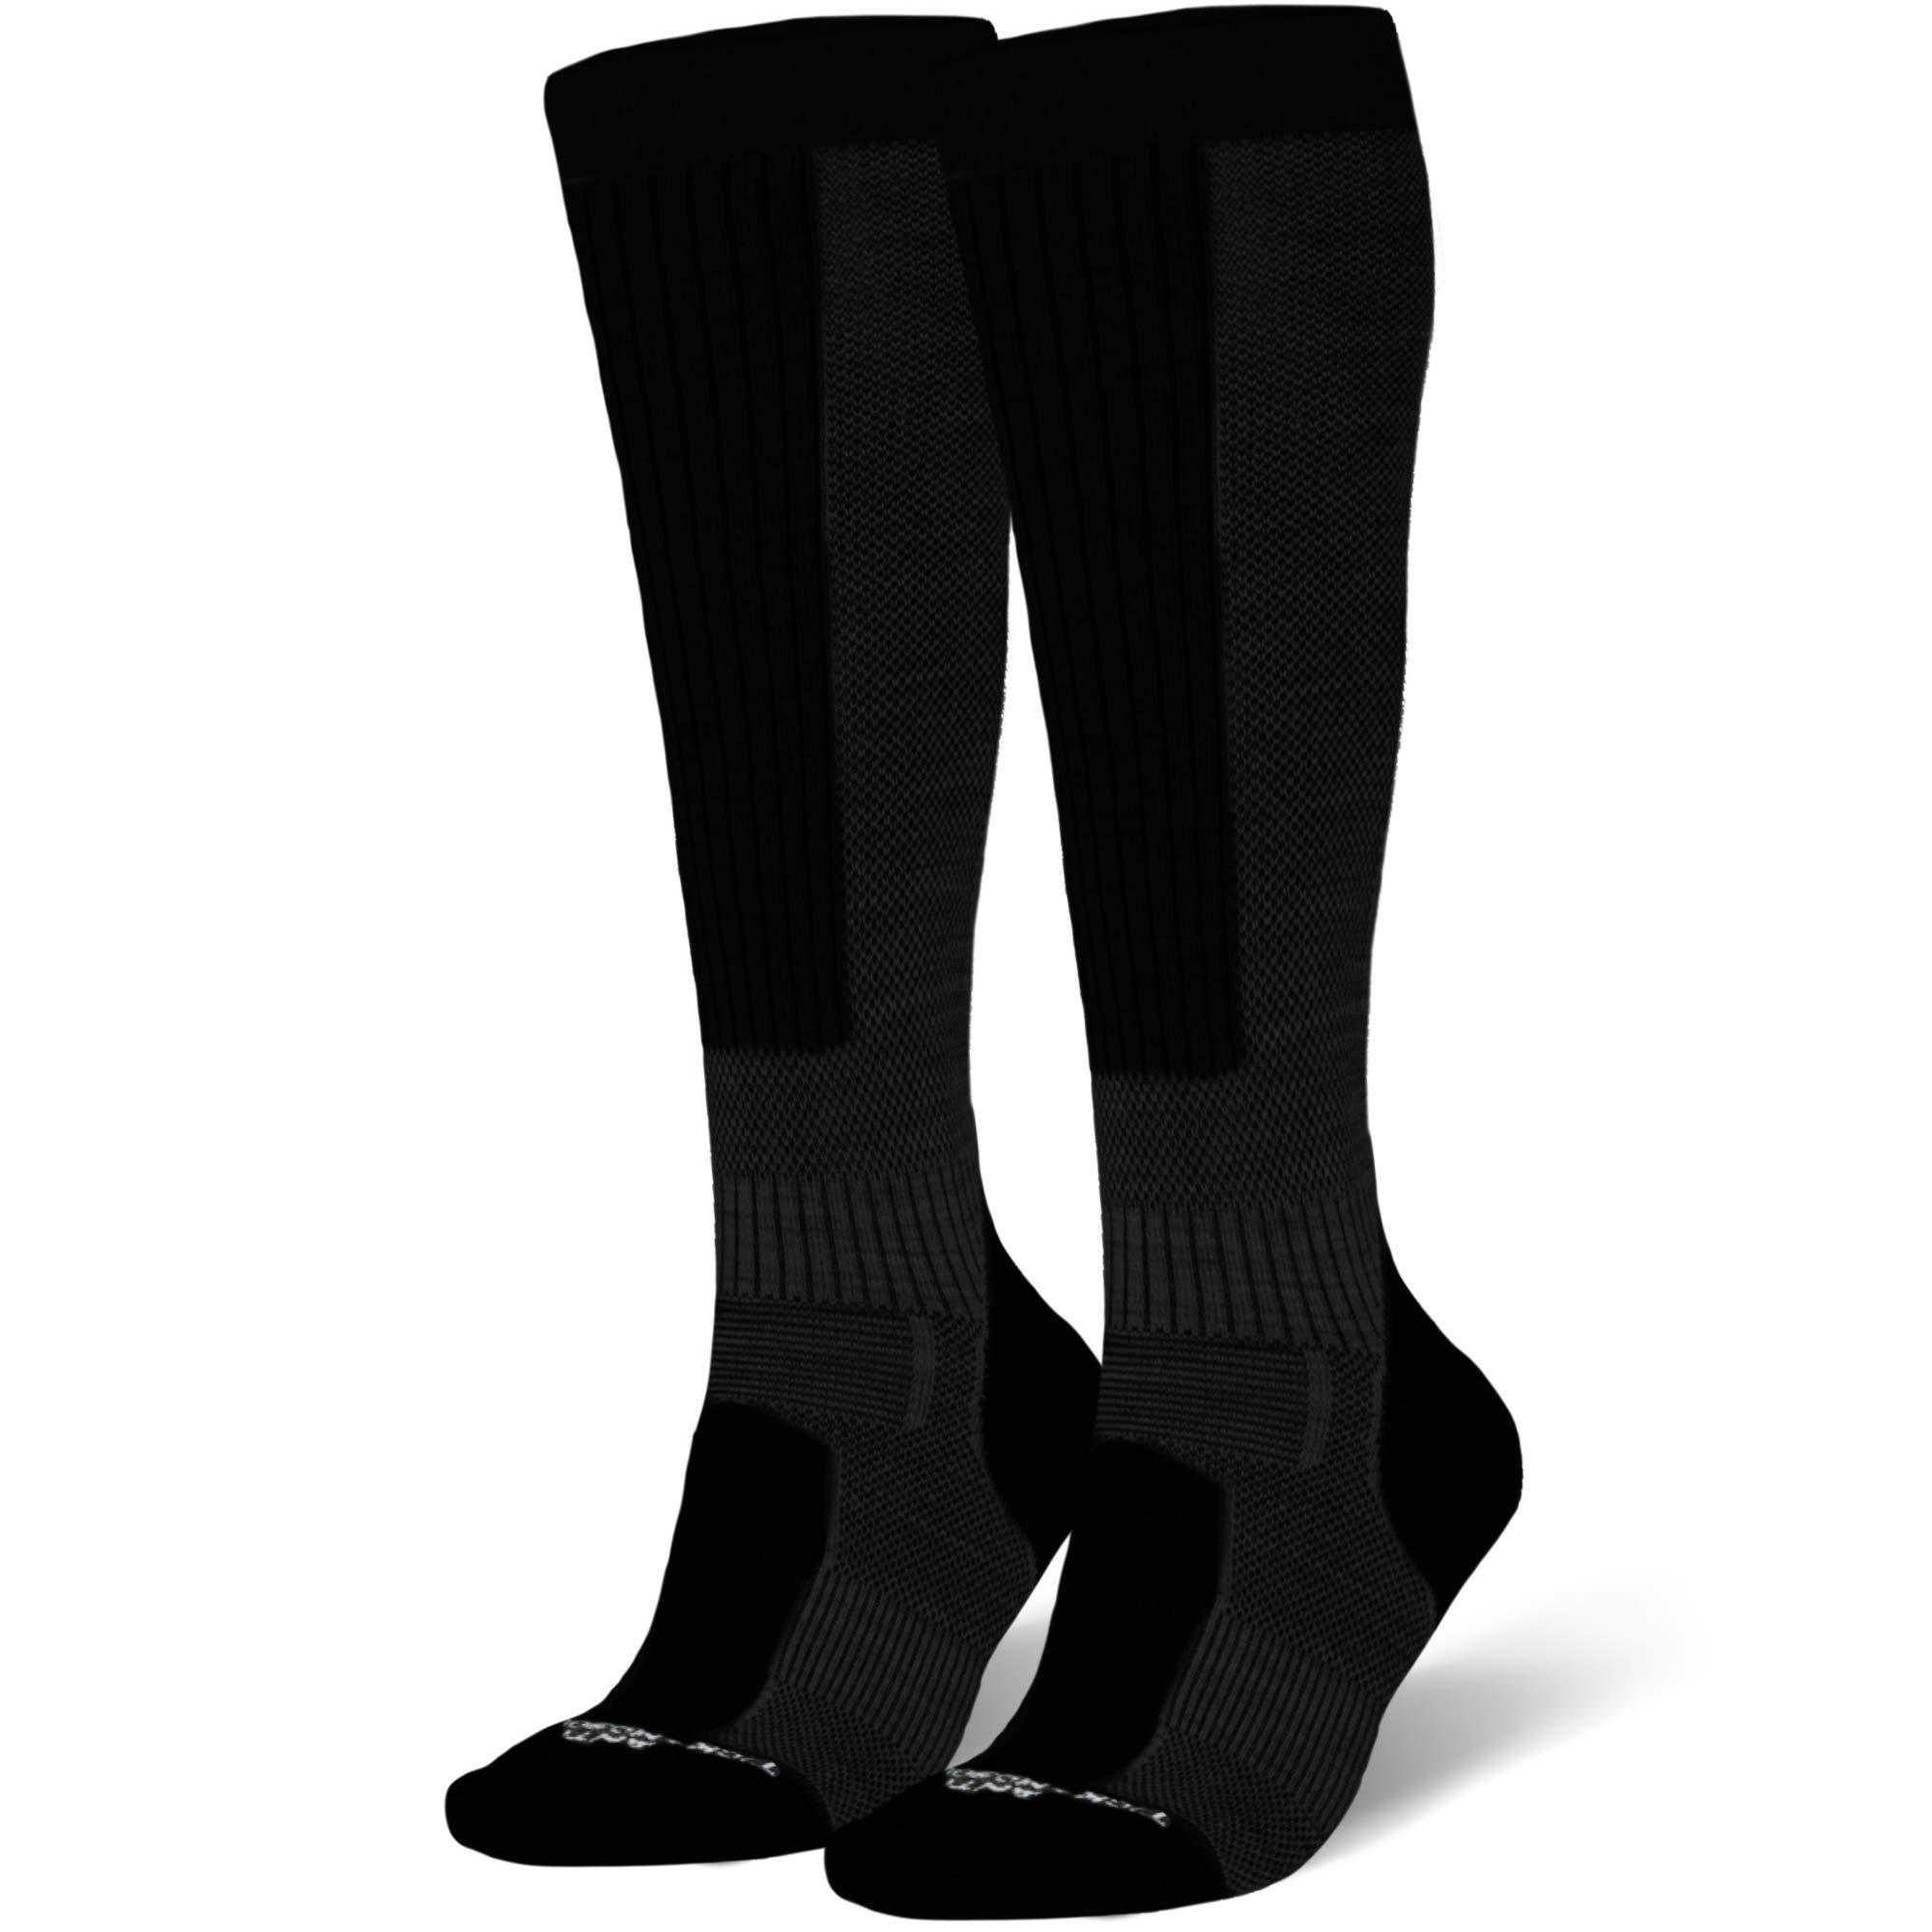 Pure Athlete Copper Compression Ski Socks Men Warm Merino Wool Women OTC